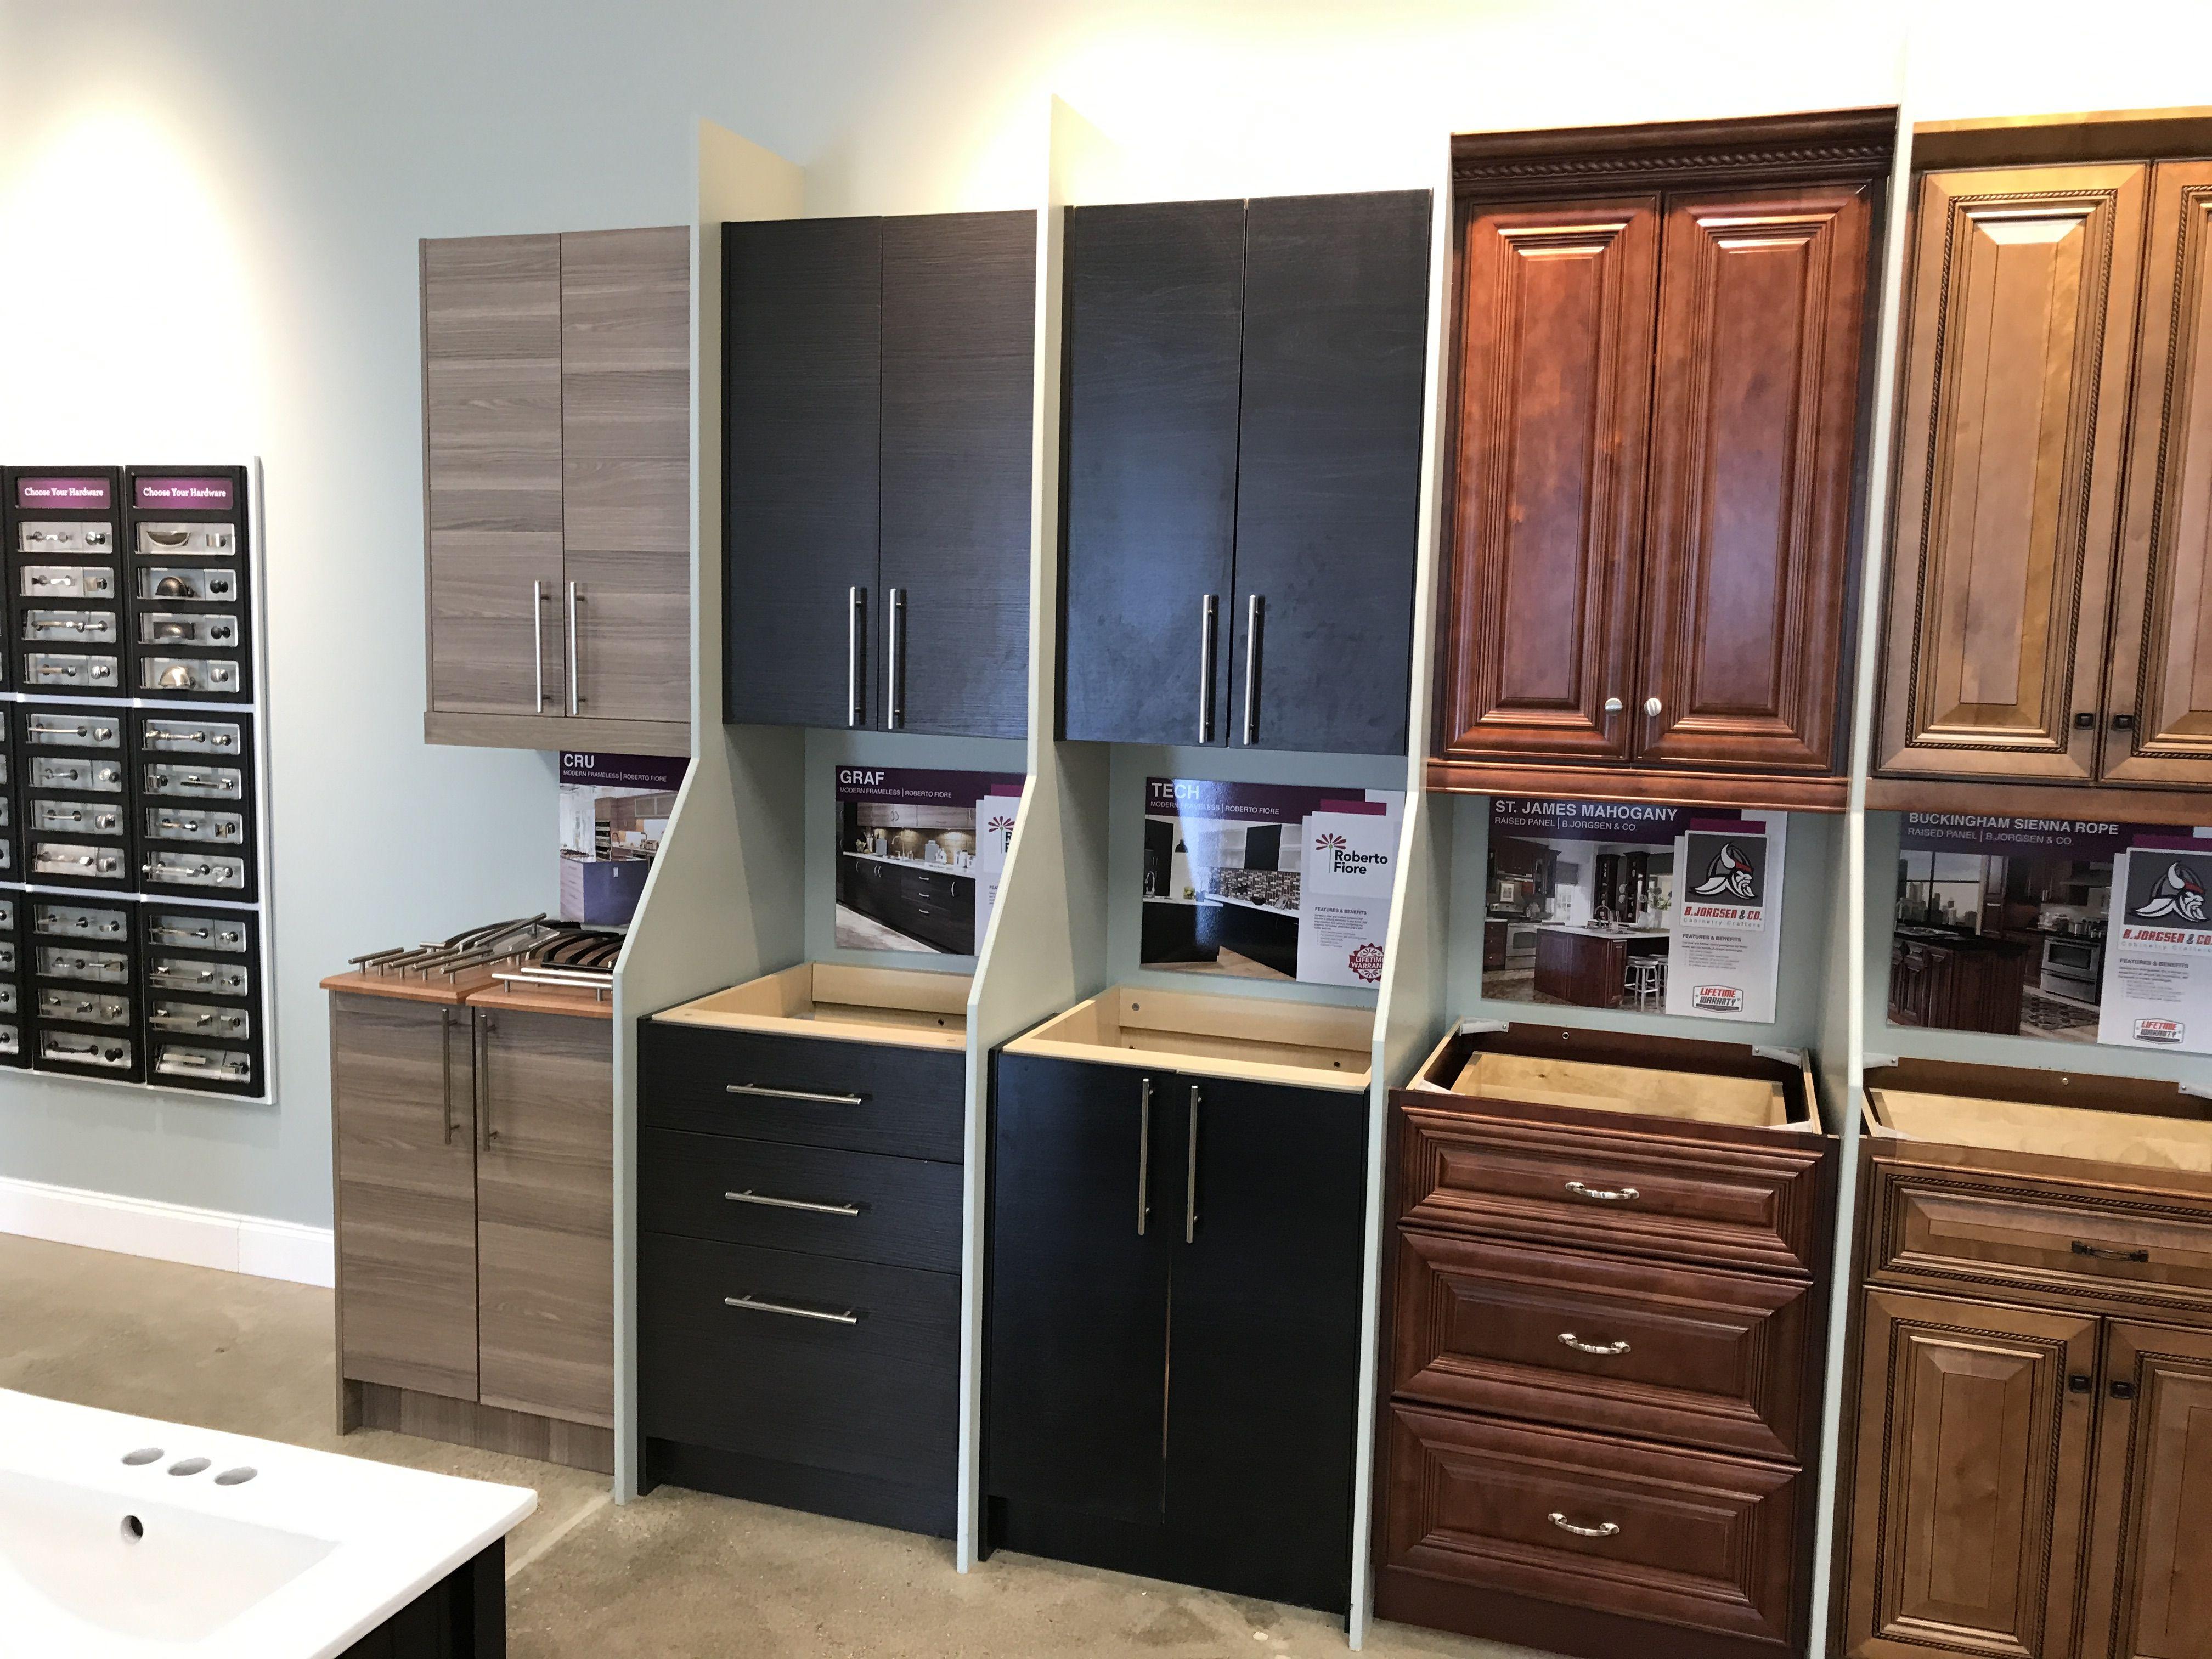 Premium Bathroom And Kitchen Cabinets In Plano Tx Quality Kitchen Cabinets Kitchen Kitchen Cabinets